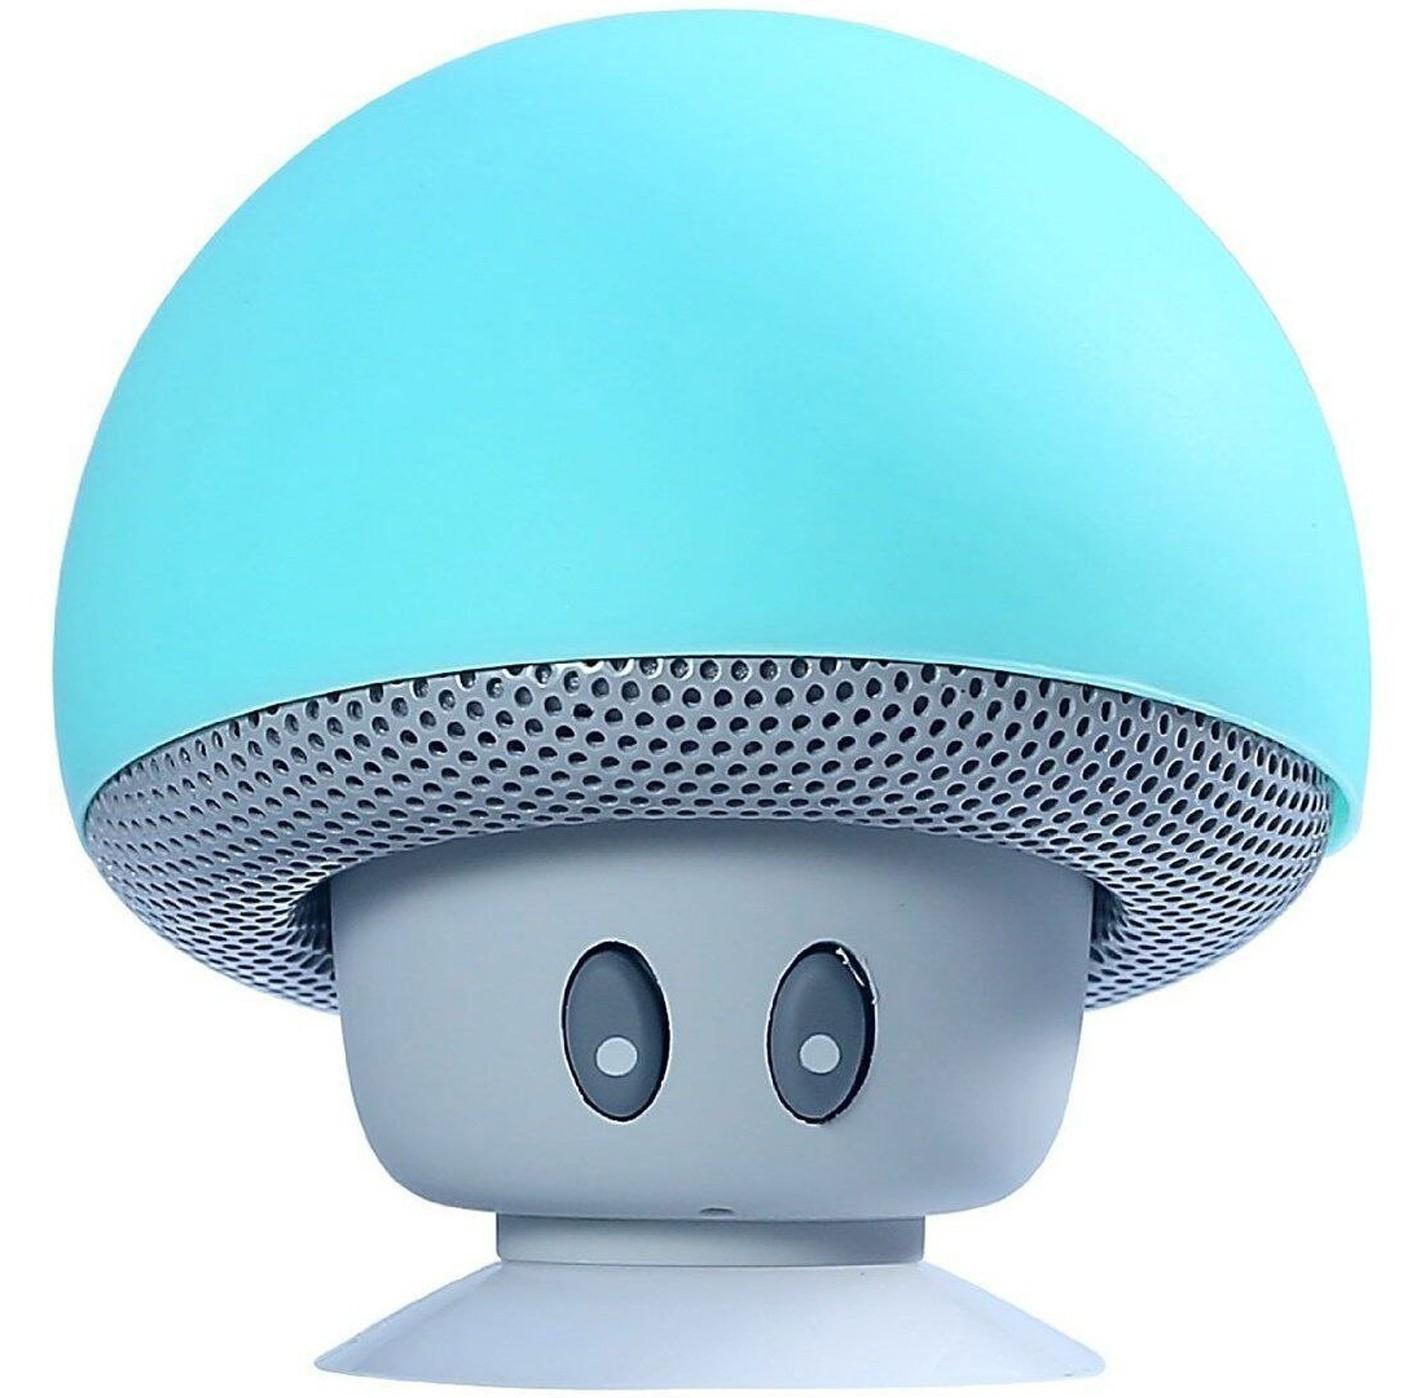 Boxa Portabila Bluetooth iUni DF17, Microfon, Apeluri Handsfree, Turquoise imagine techstar.ro 2021